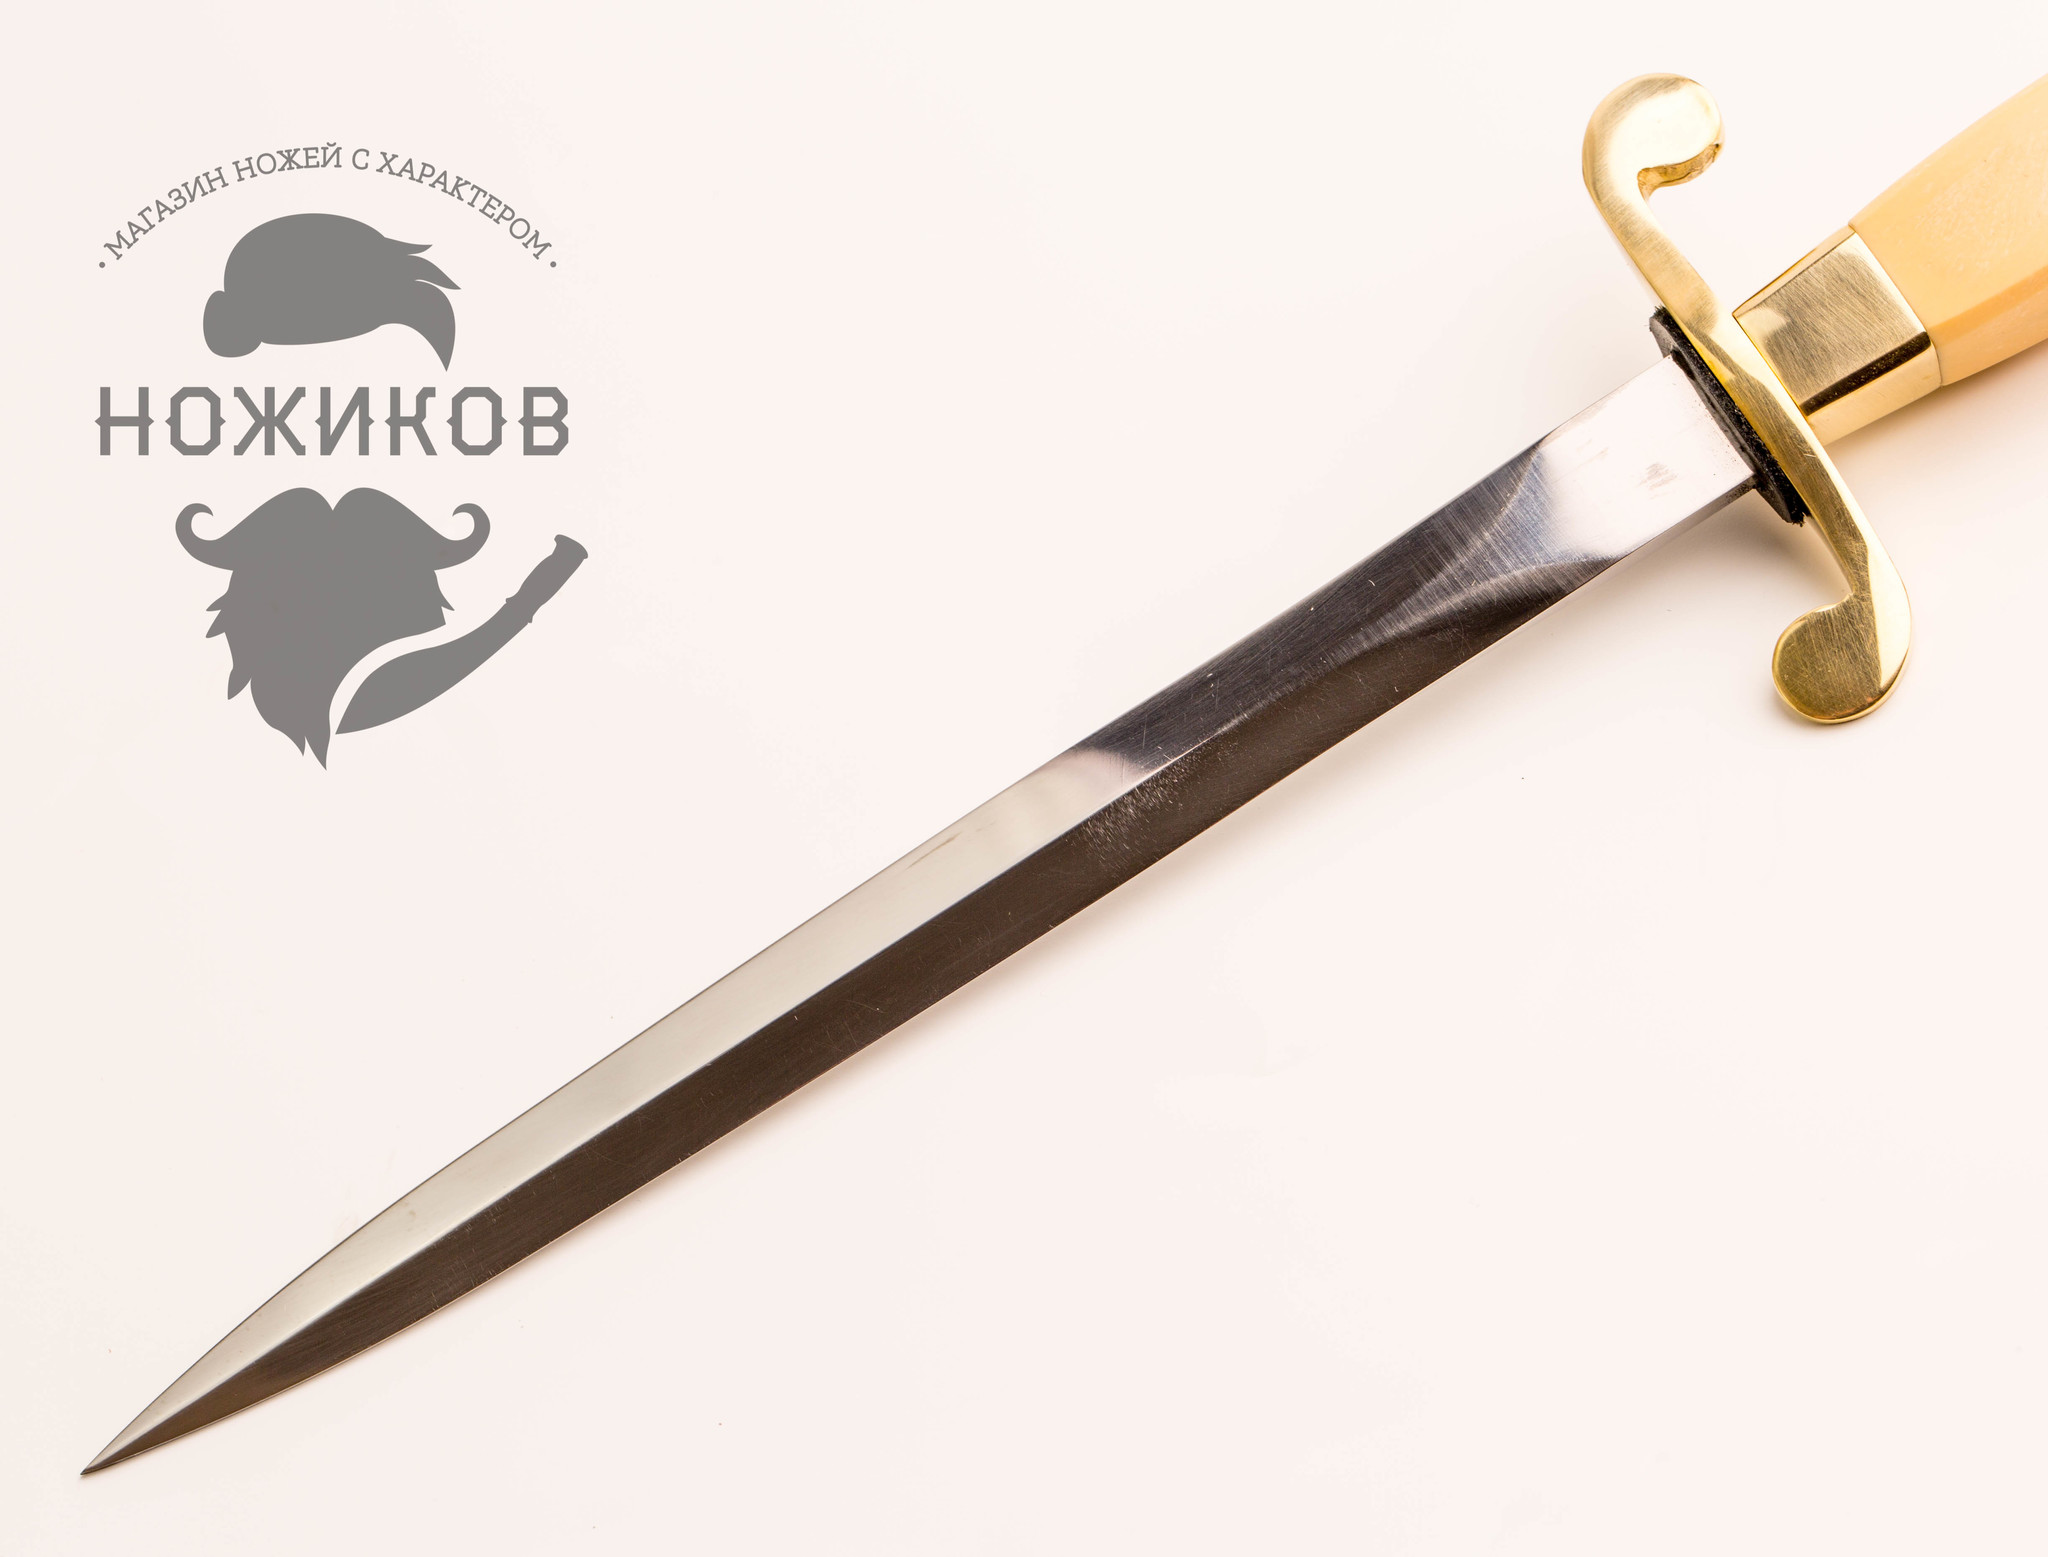 Фото 4 - Кортик Офицерский ВМФ СССР от Noname